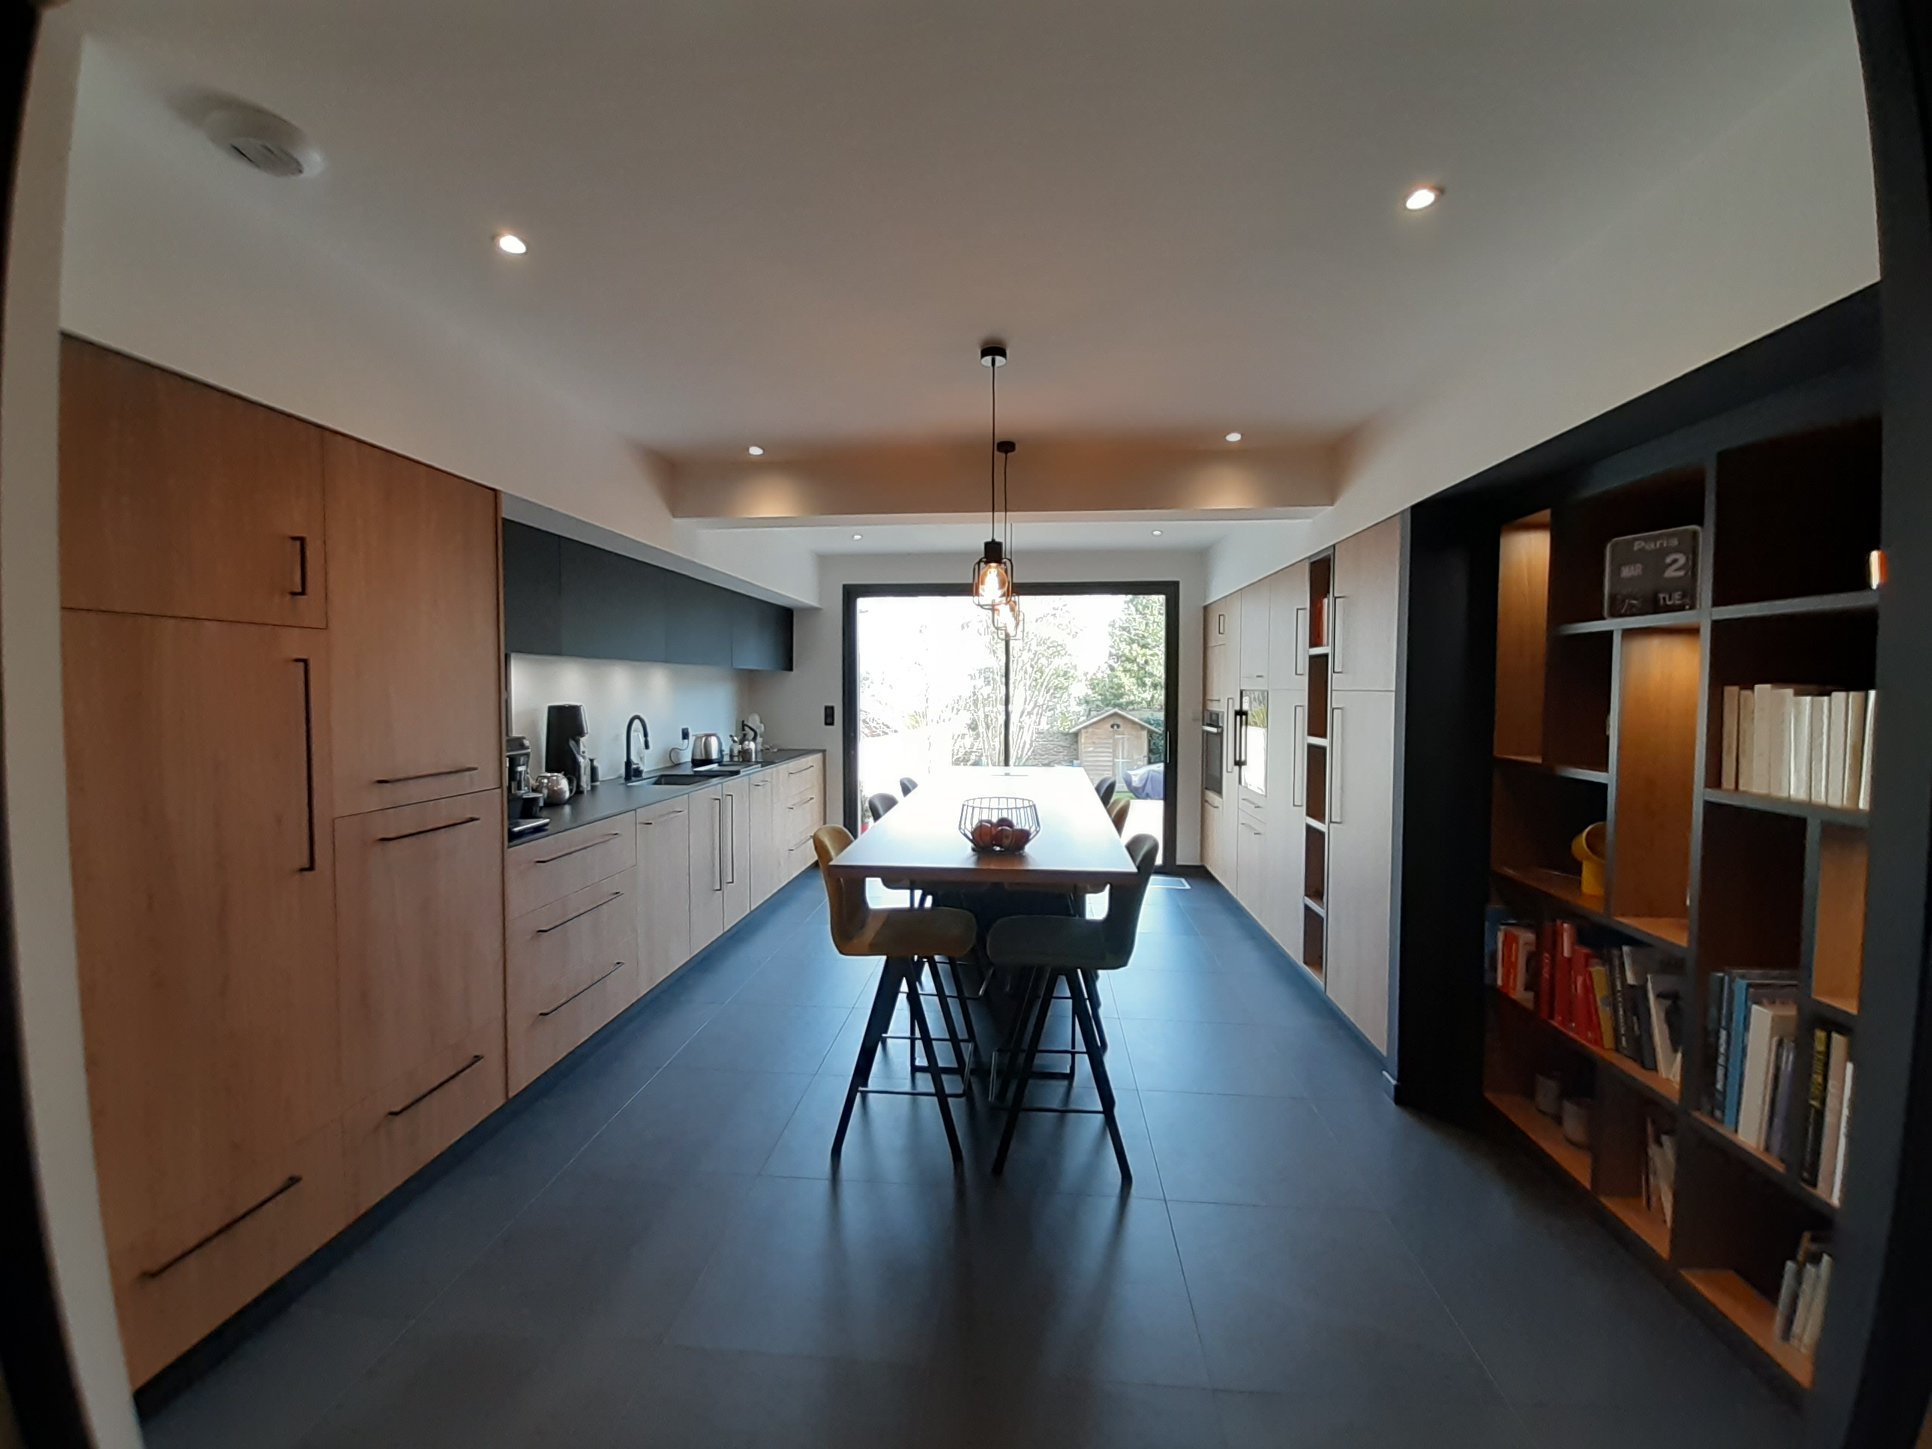 salon cuisine aménagé sur mesure